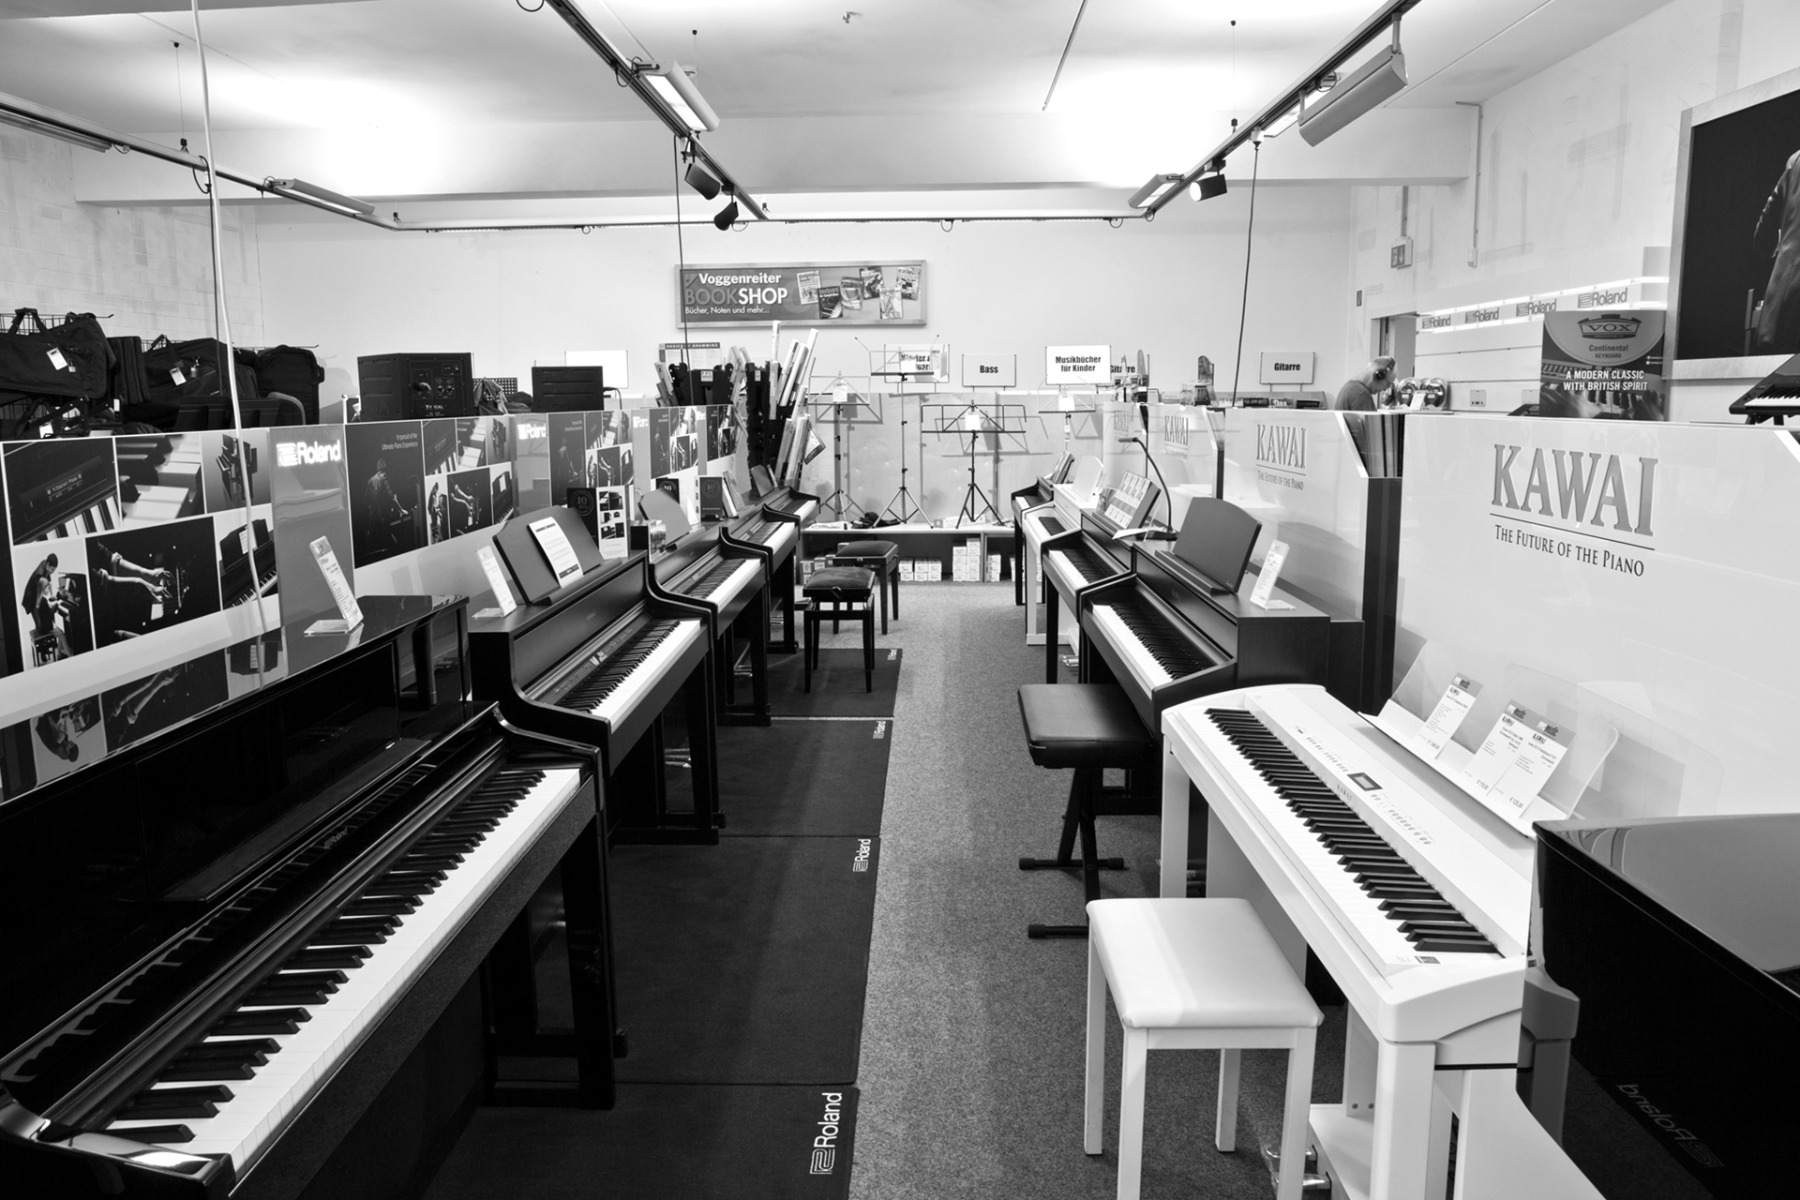 keyboard und piano